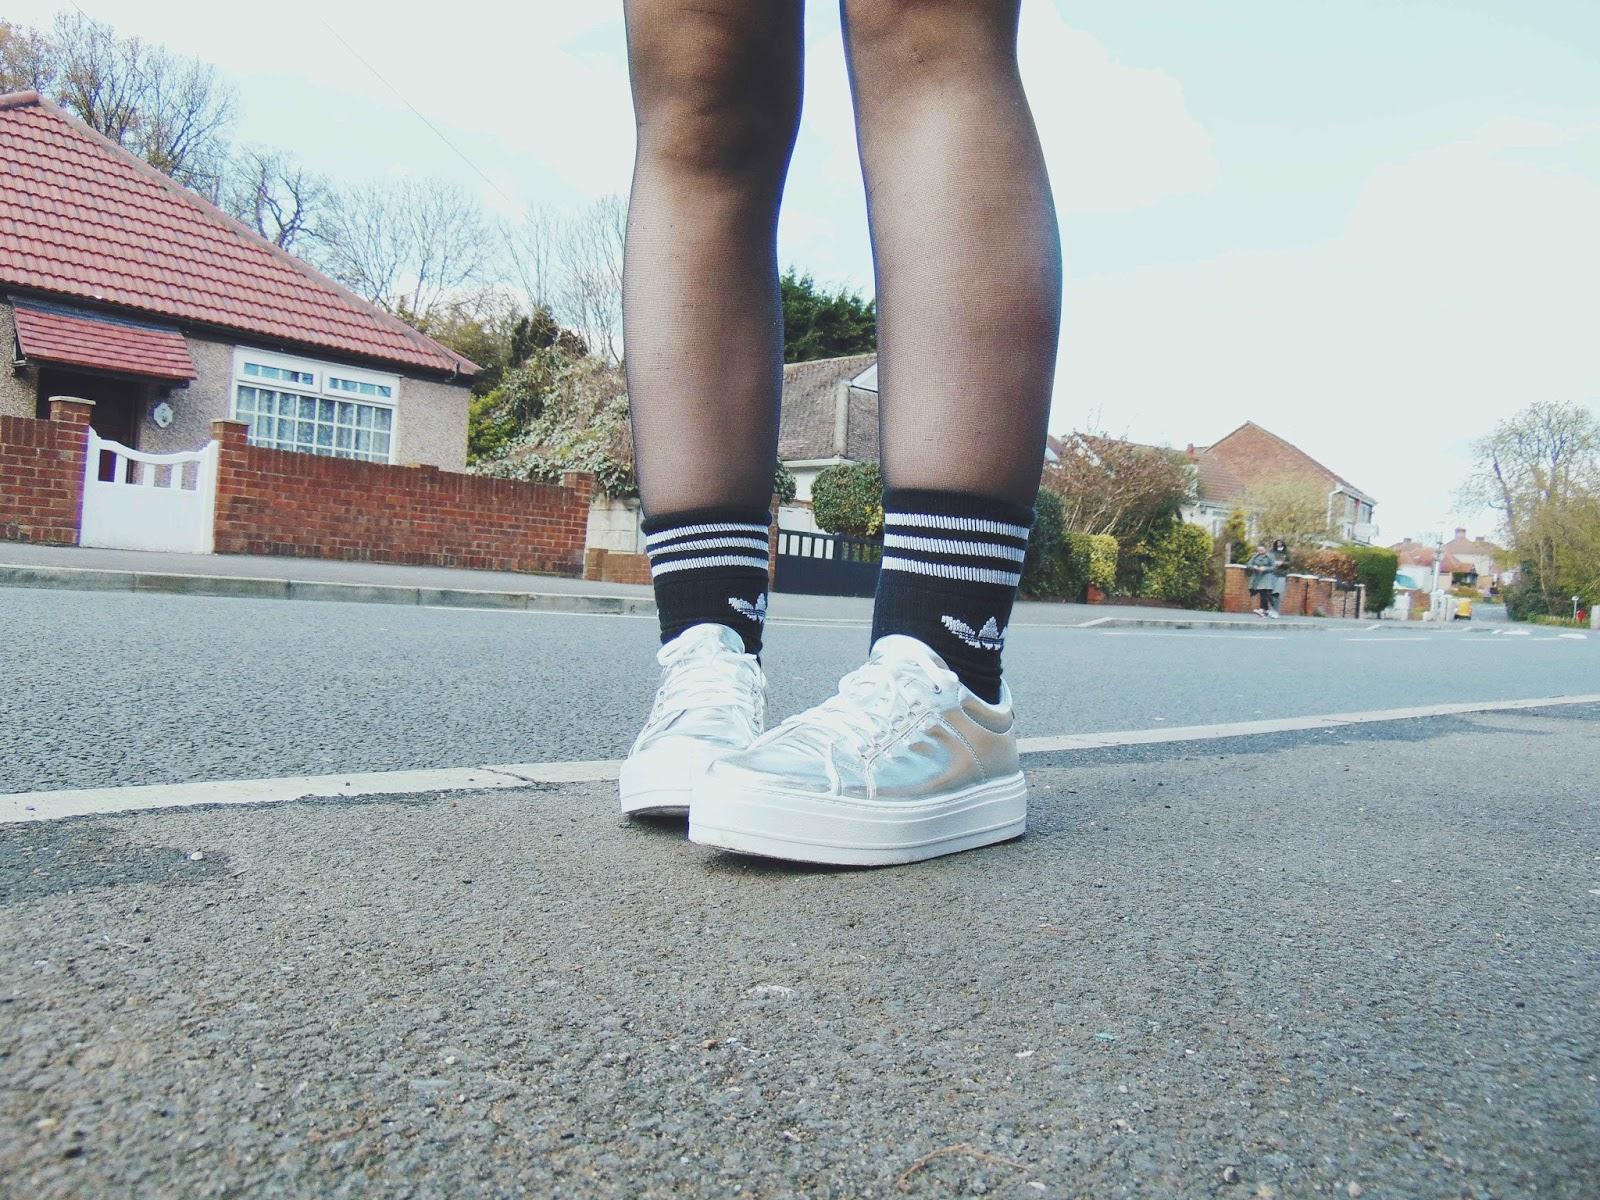 vintage jumper, vintage animal print jumper, button down denim skirt, silver platform trainers, silver flatform shoes, adidas socks, alternative fashion style, 90's outfit ootd